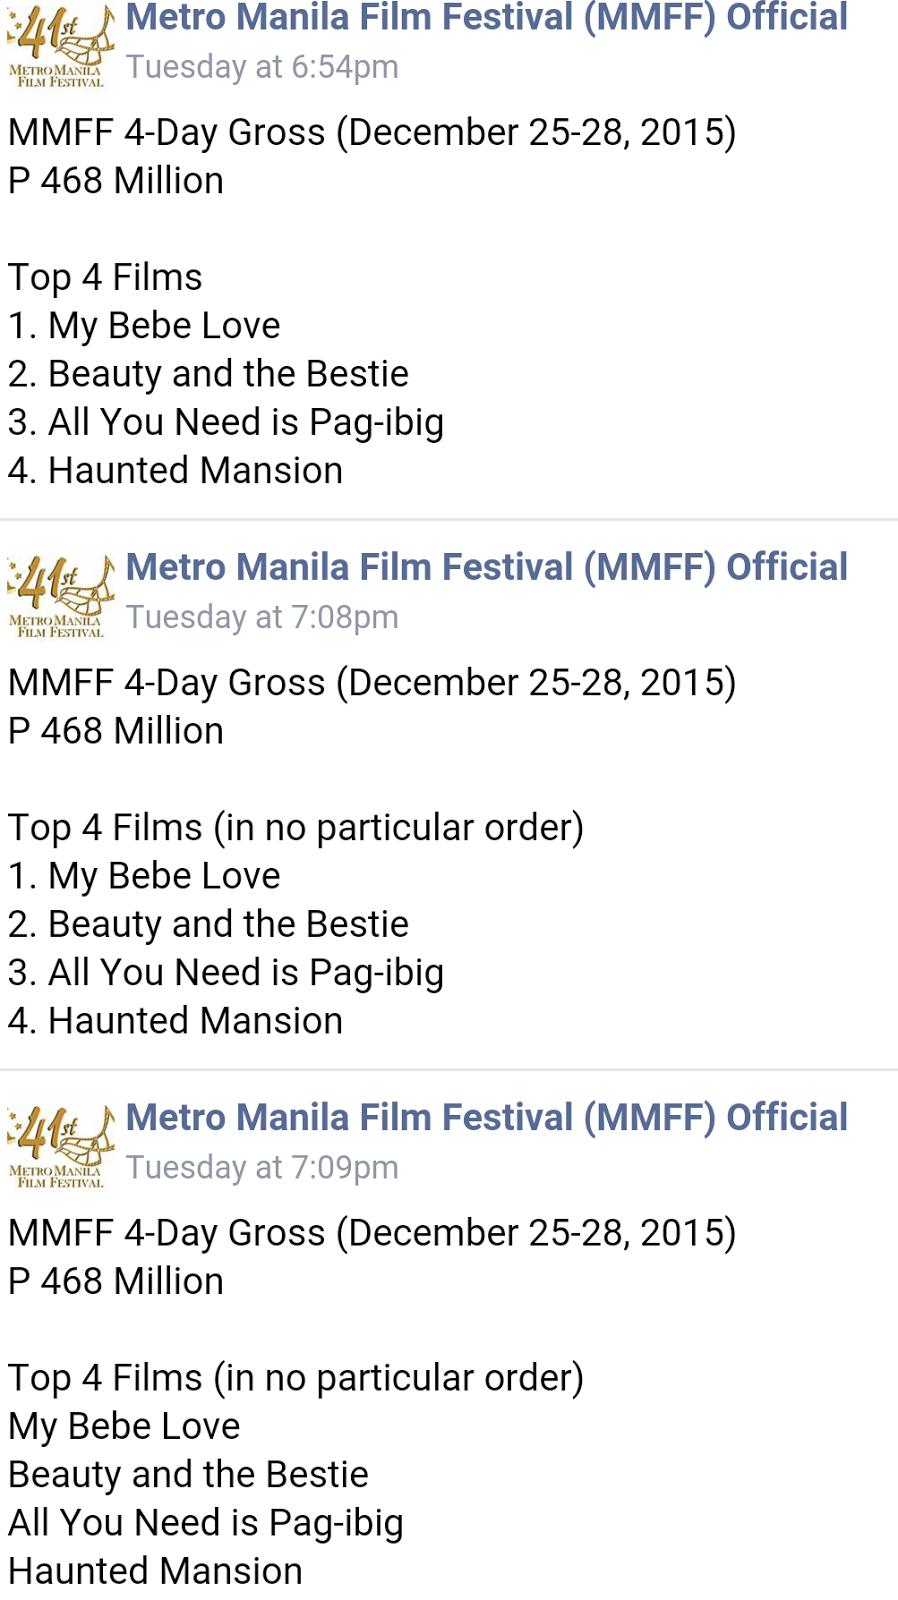 MMFF 2015 Box Office Ranking